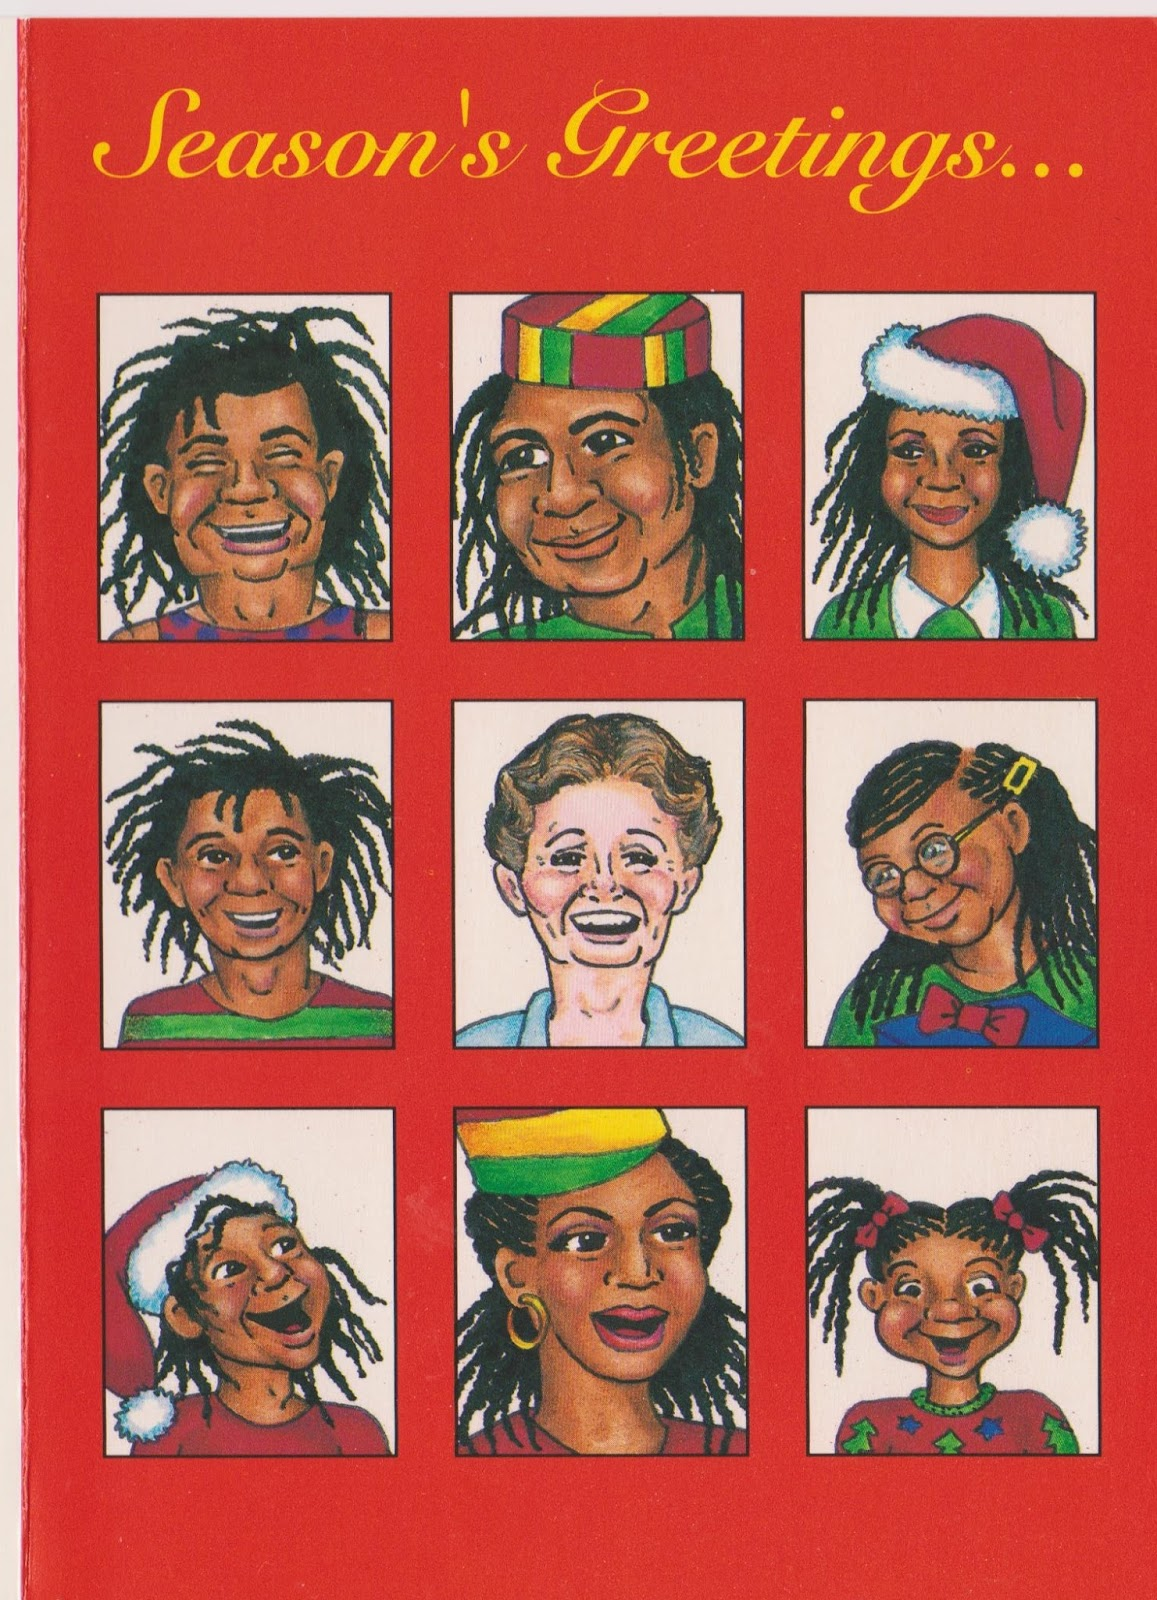 The Brady Bunch Blog: Christmas Card Late 1980s